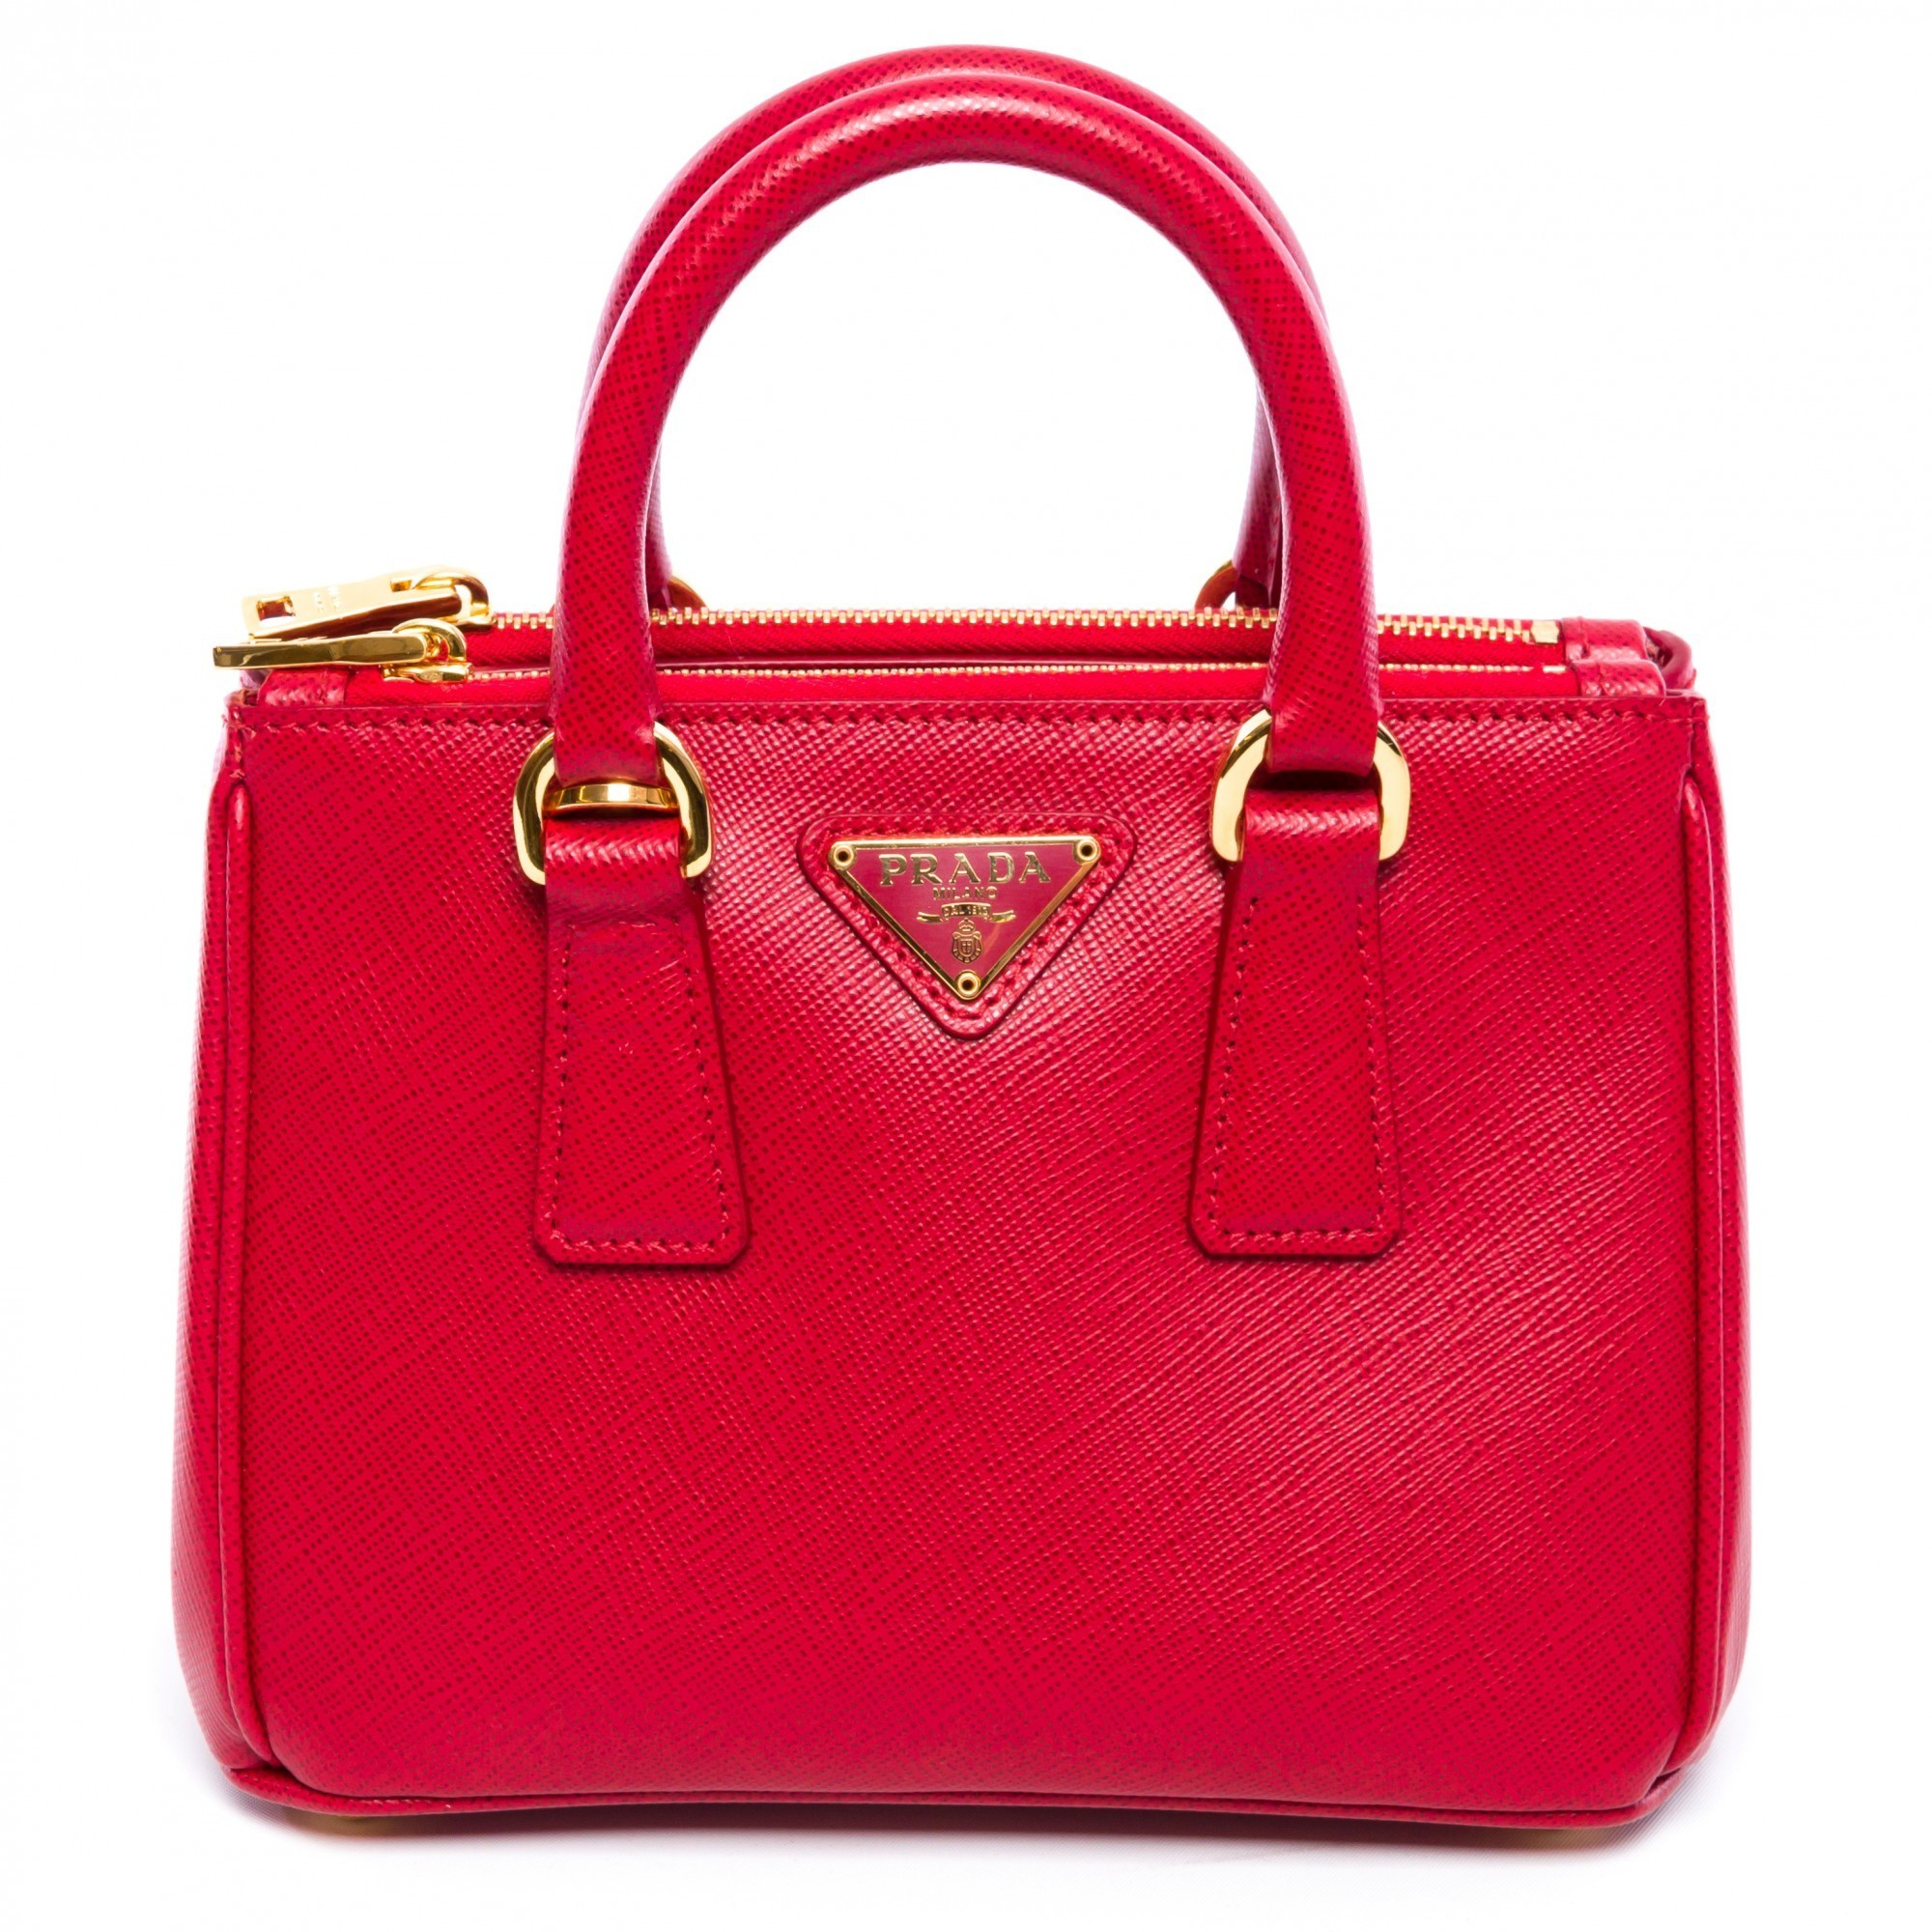 0f72d87cc32c Prada Mini Saffiano Leather Galleria Crossbody Handbag - Red - Check ...